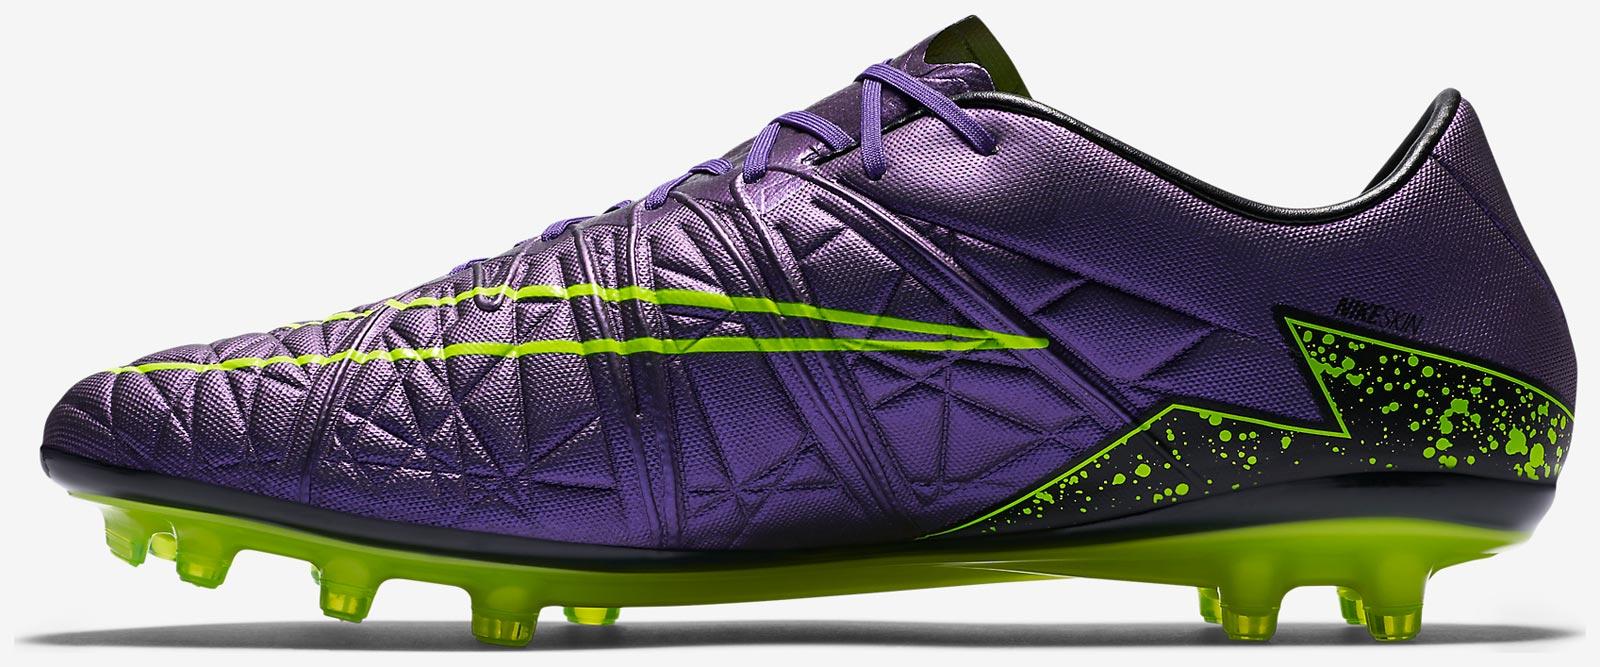 Purple Nike Hypervenom Phinish 2 2015-2016 Boots Released